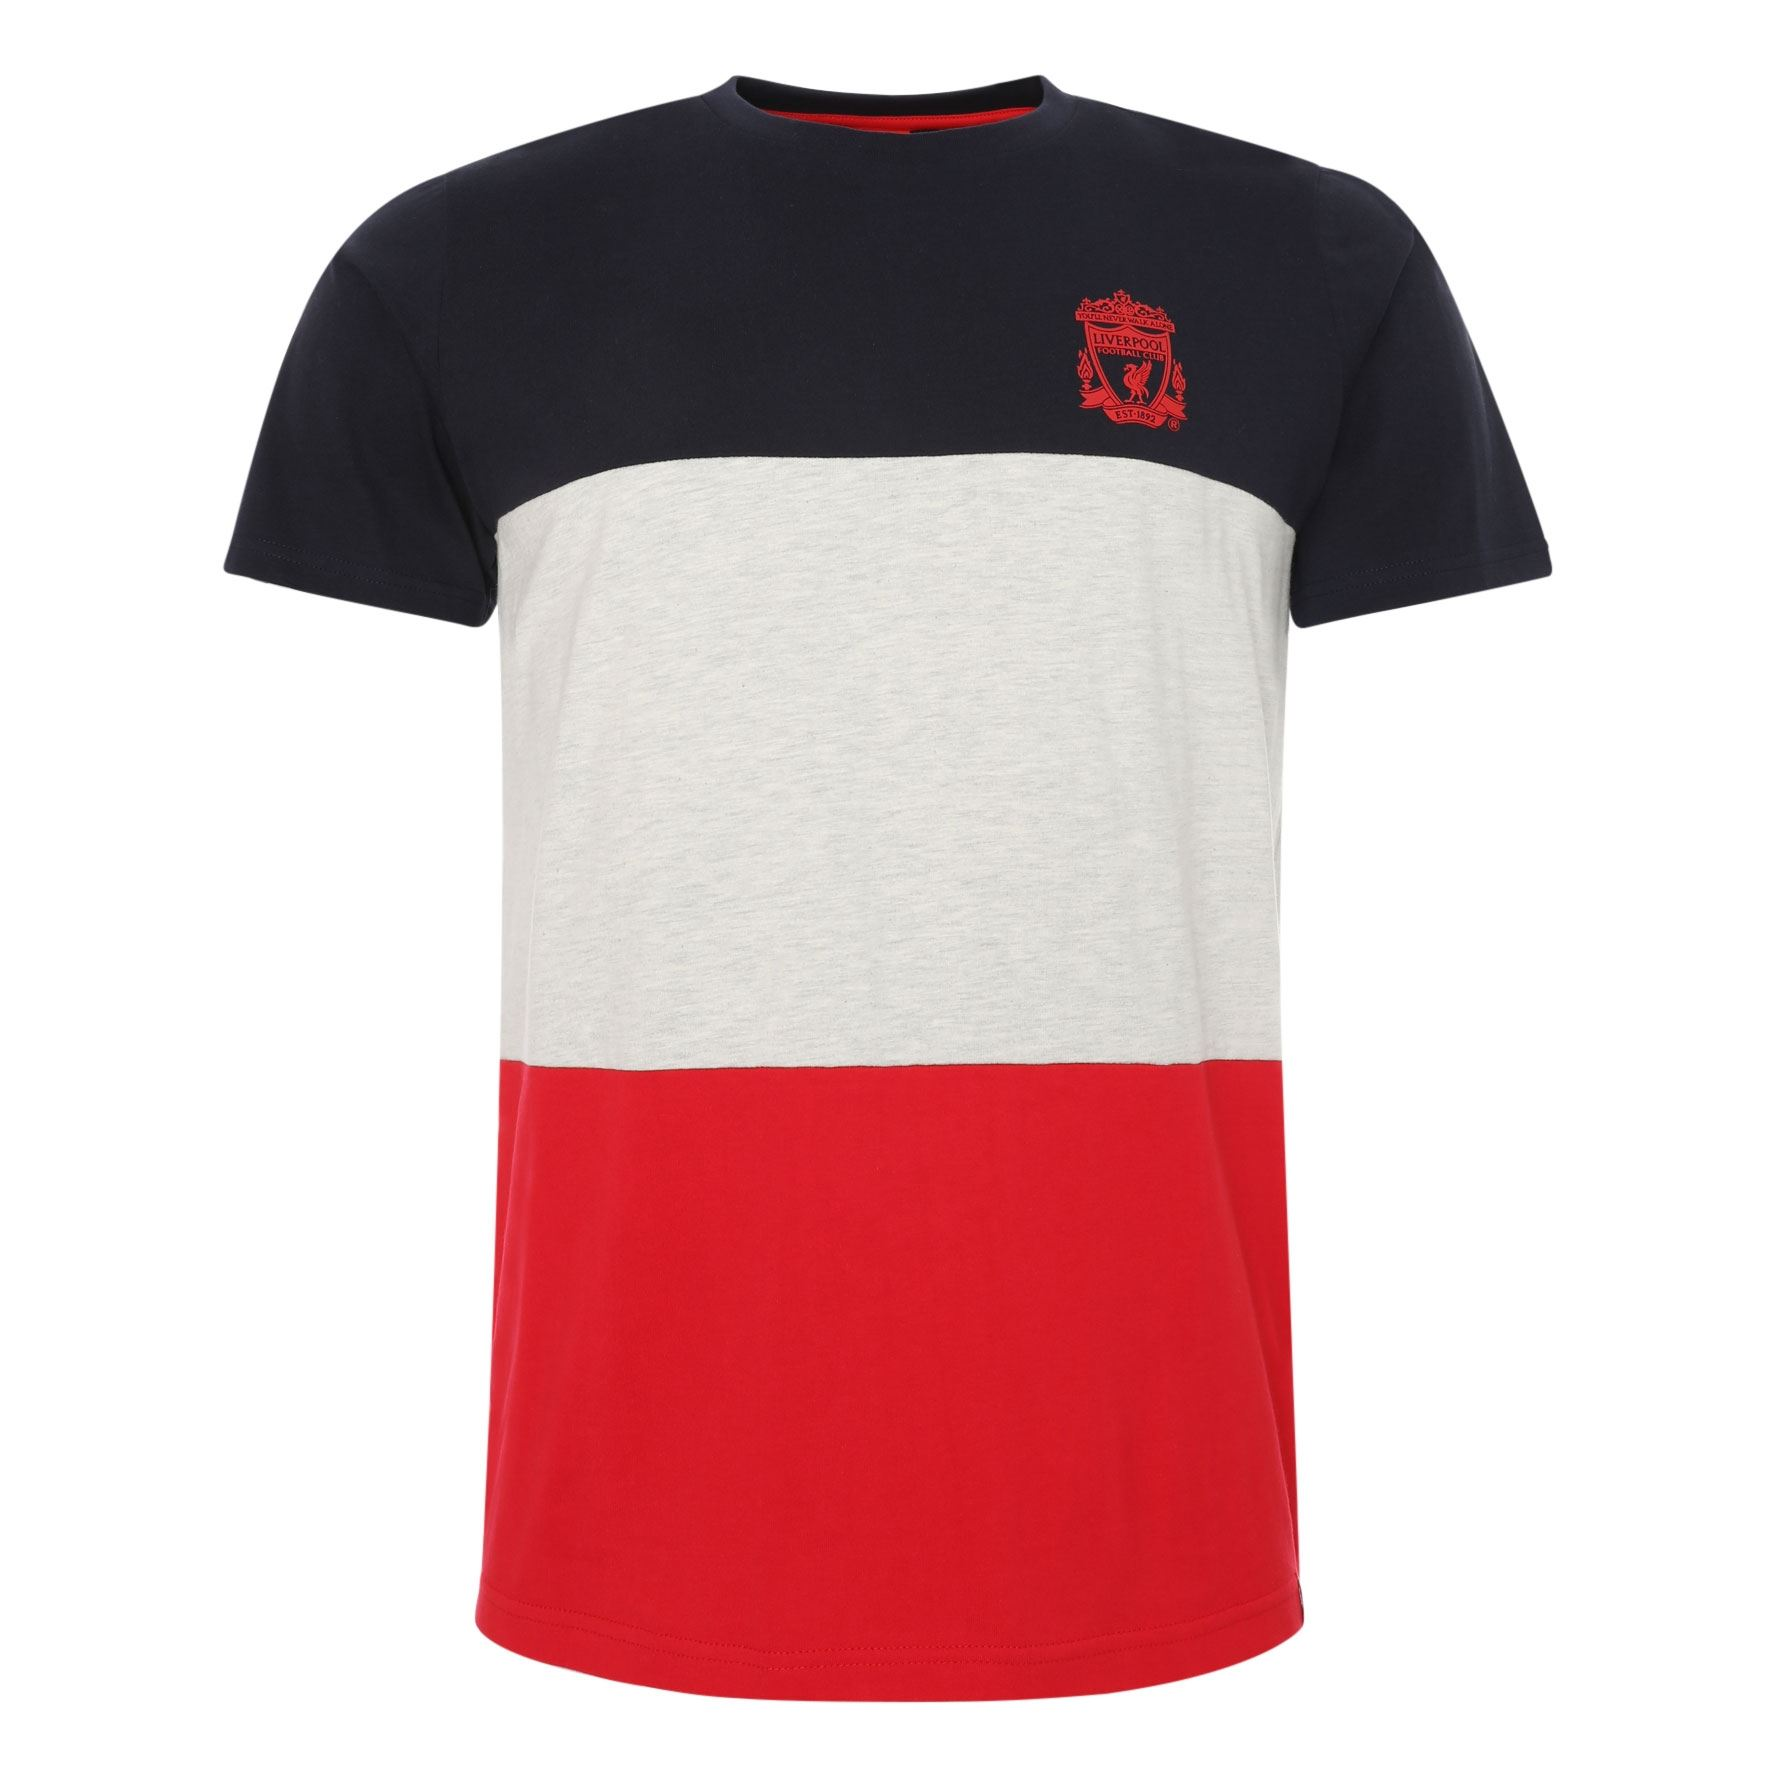 Liverpool FC T-Shirt Liverpool FC Rouge Homme LFC Officiel